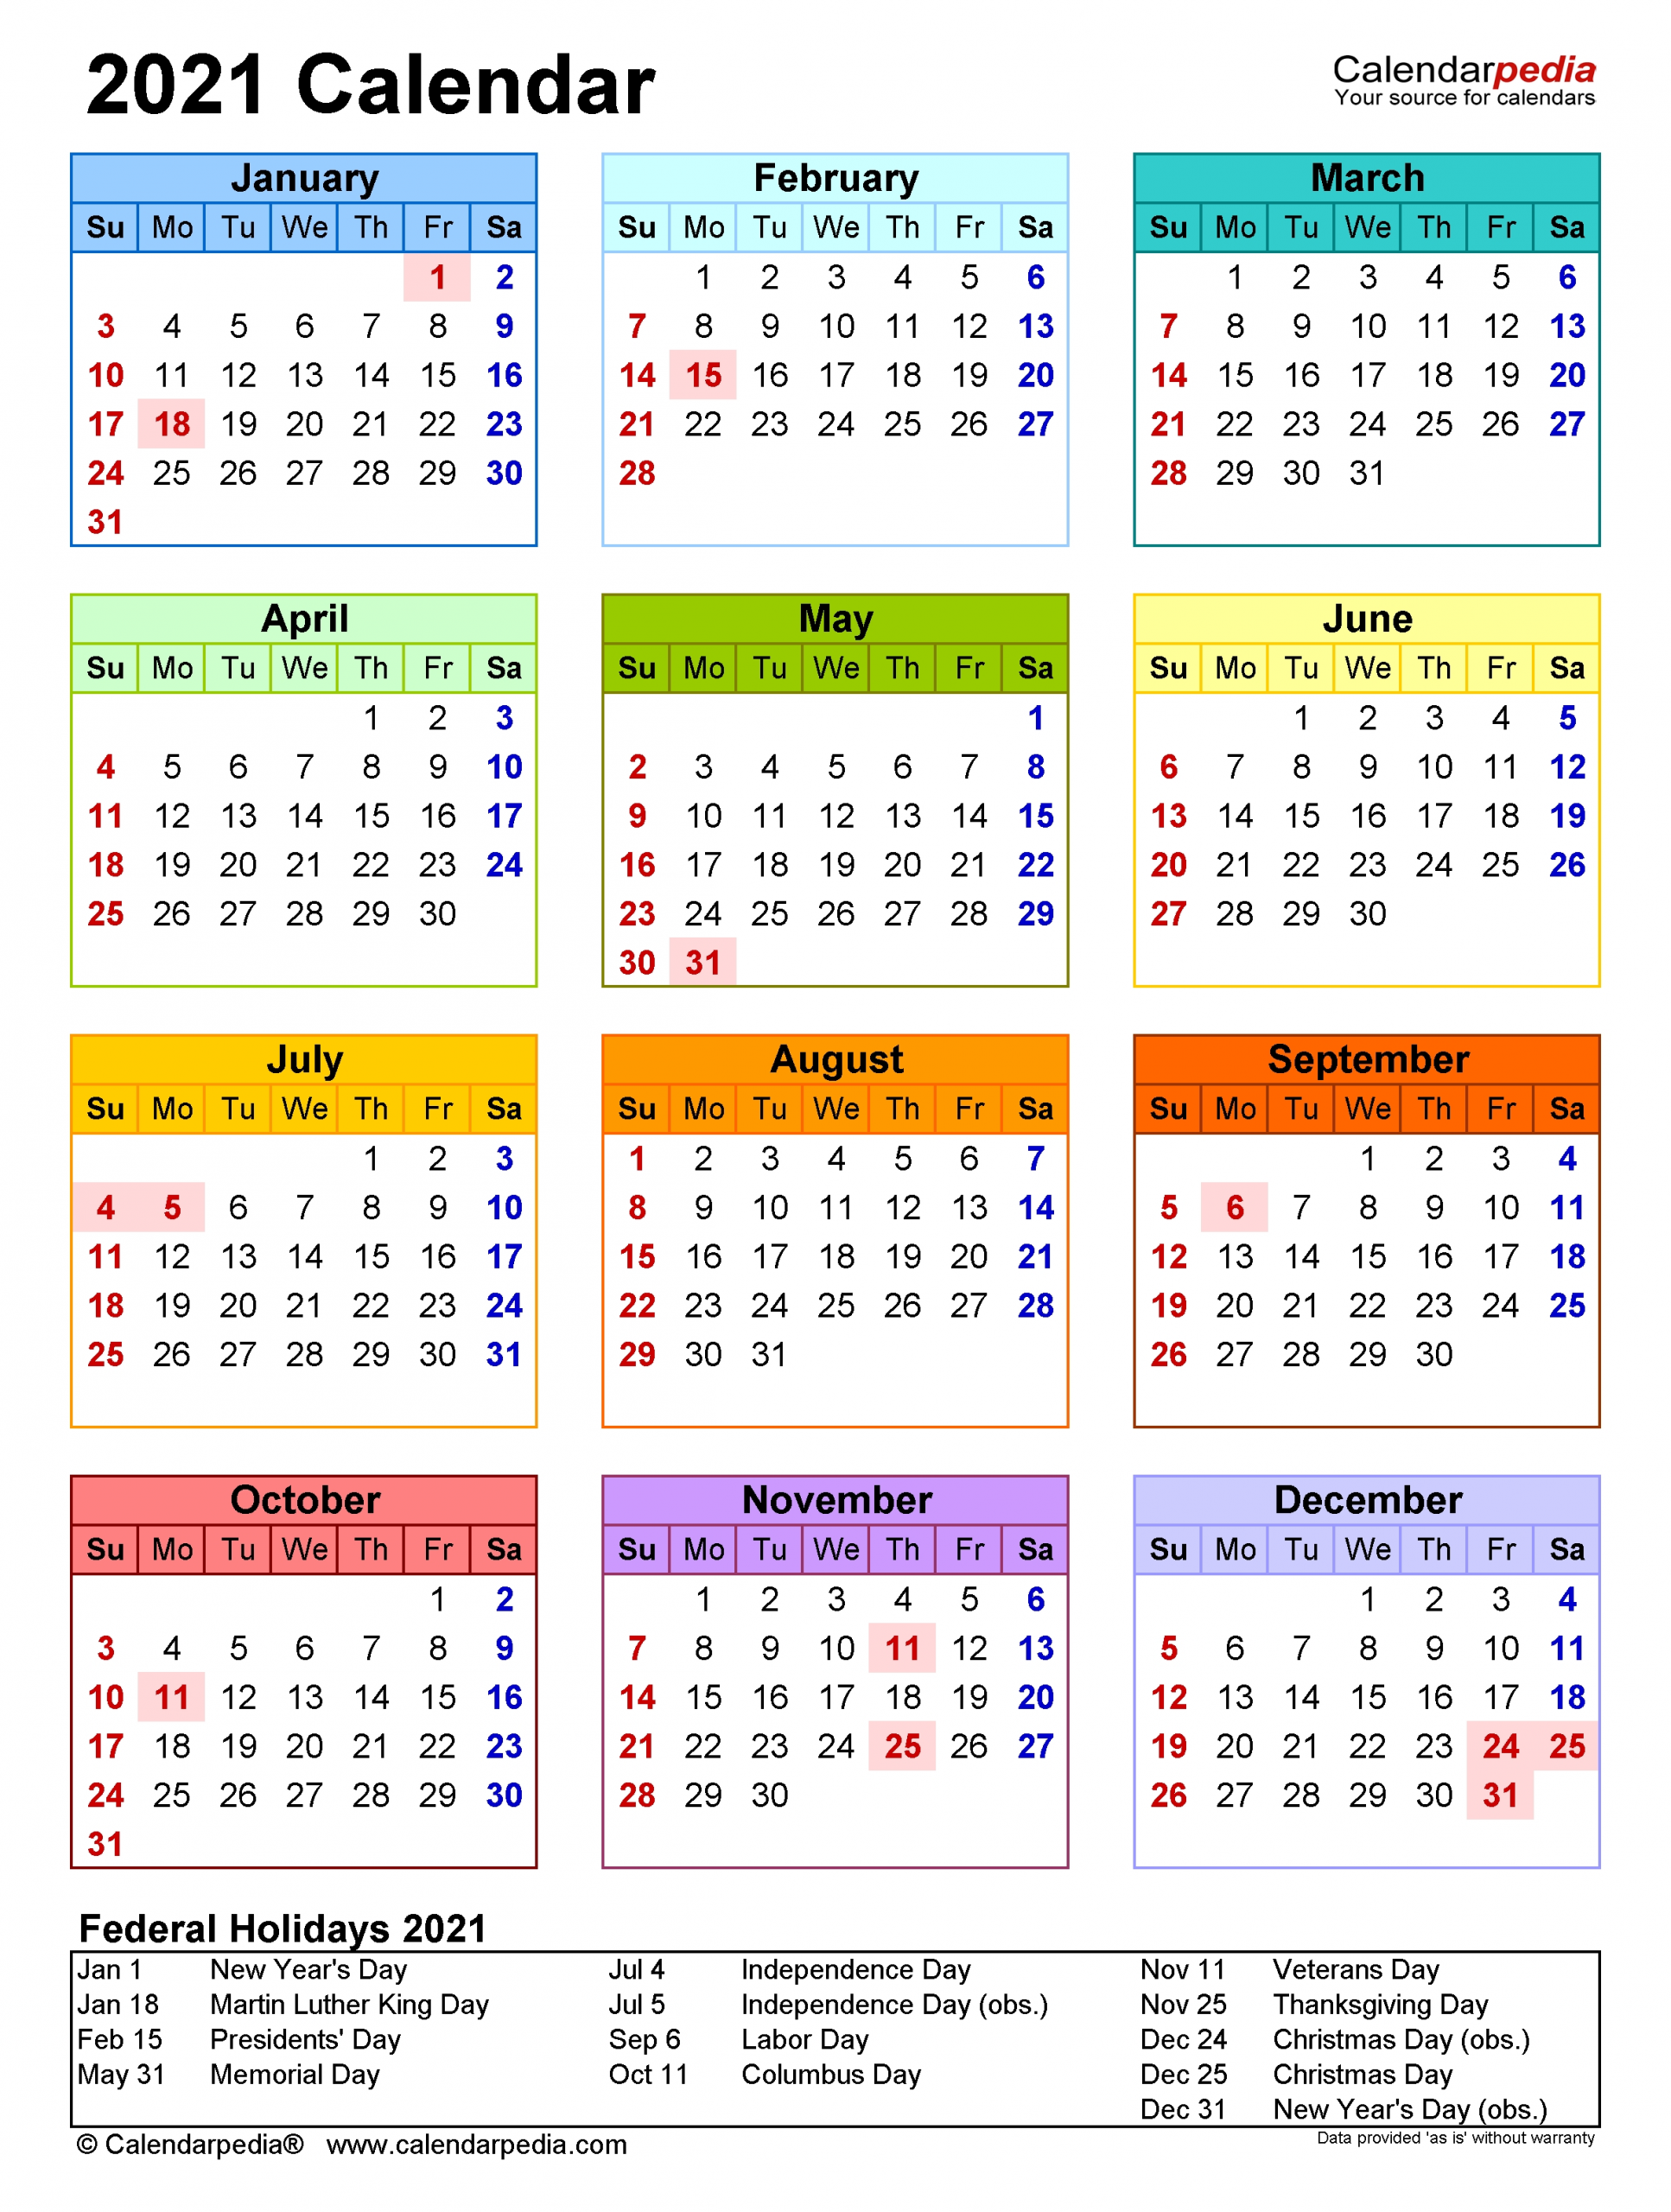 2021 Calendar - Free Printable Pdf Templates - Calendarpedia